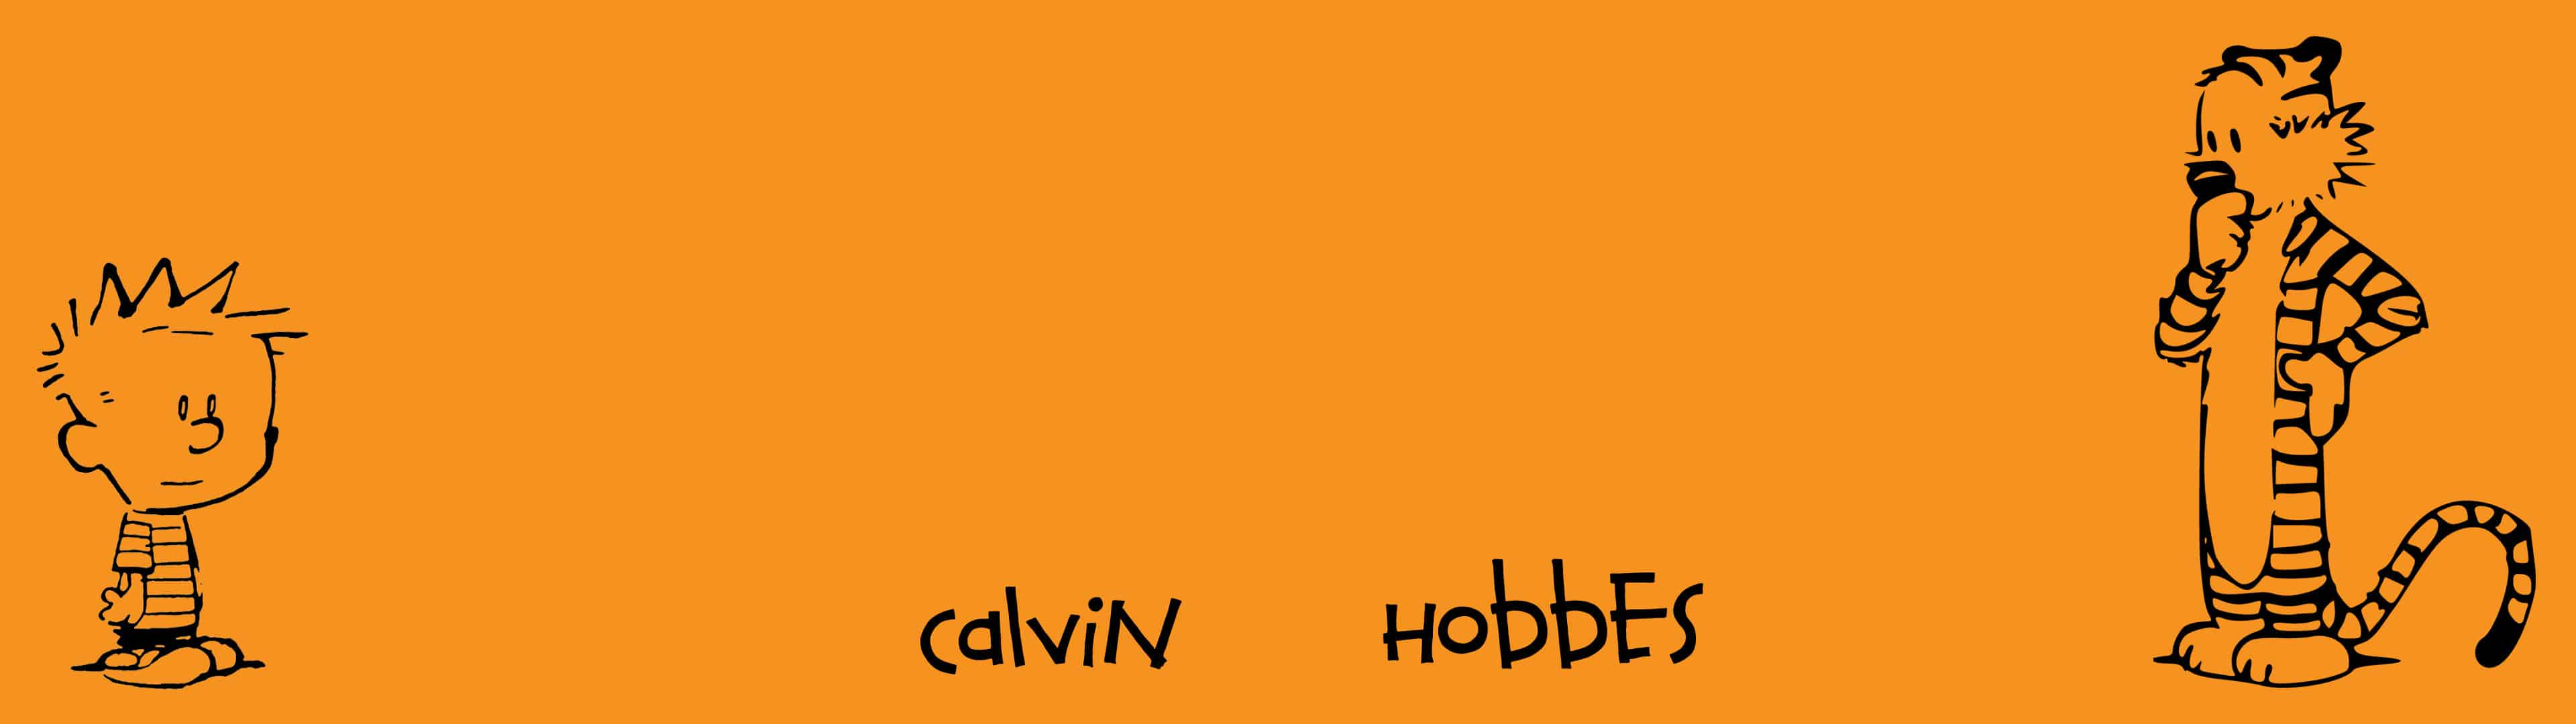 Calvin And Hobbes Dual Monitor Wallpaper   Pixelzcc 3840x1080